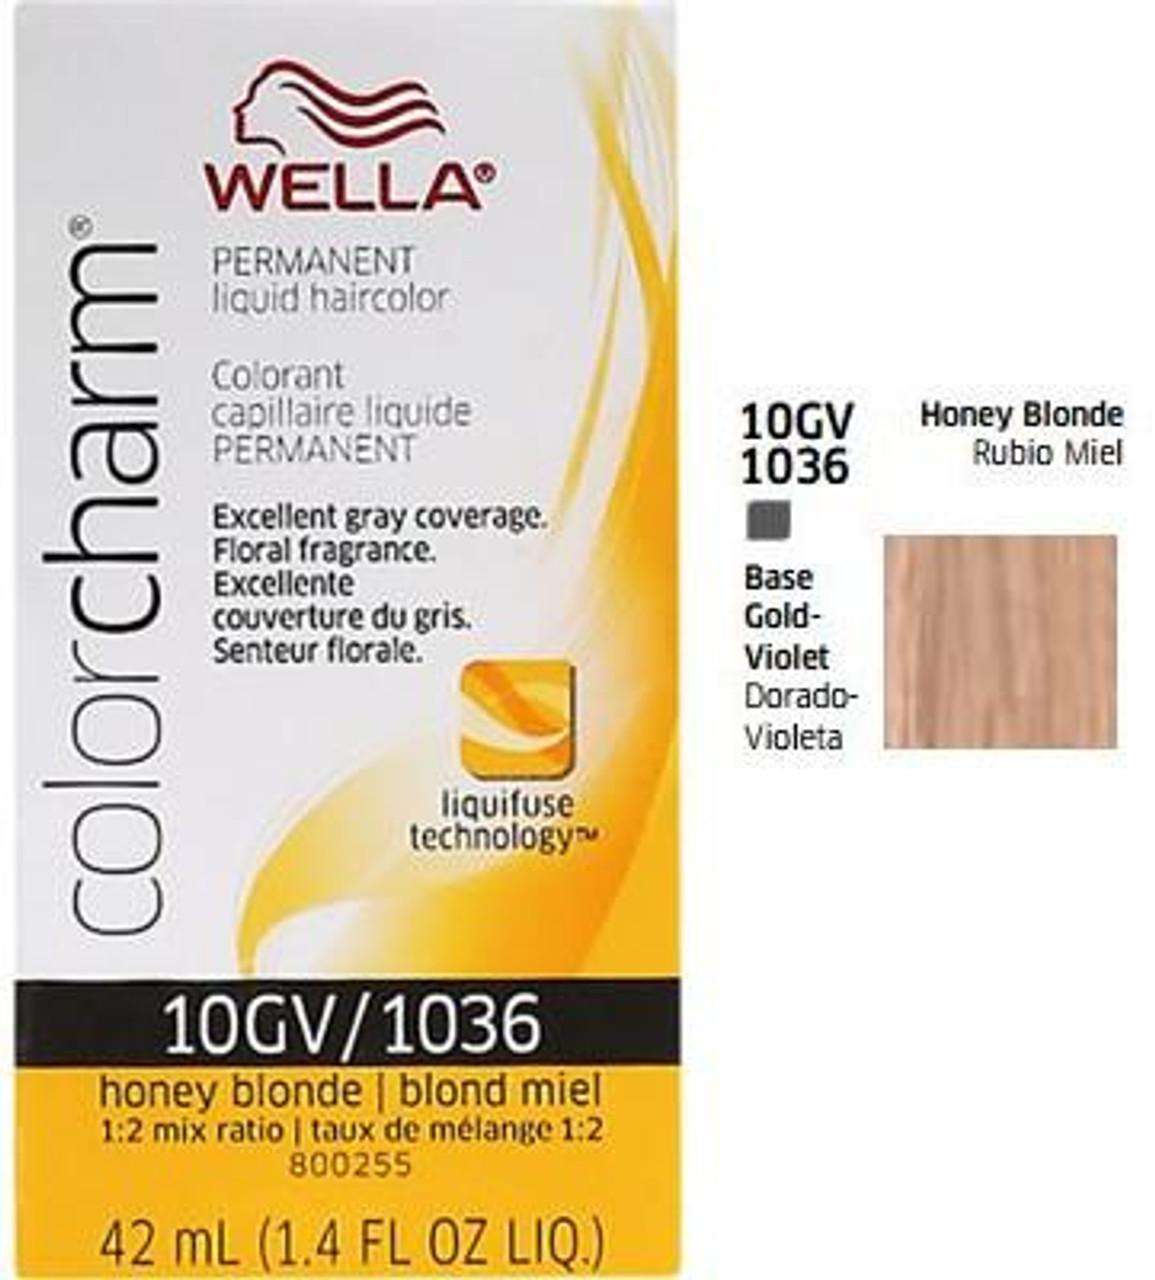 Wella 1036 Color Charm 1.4 oz - Honey Blonde